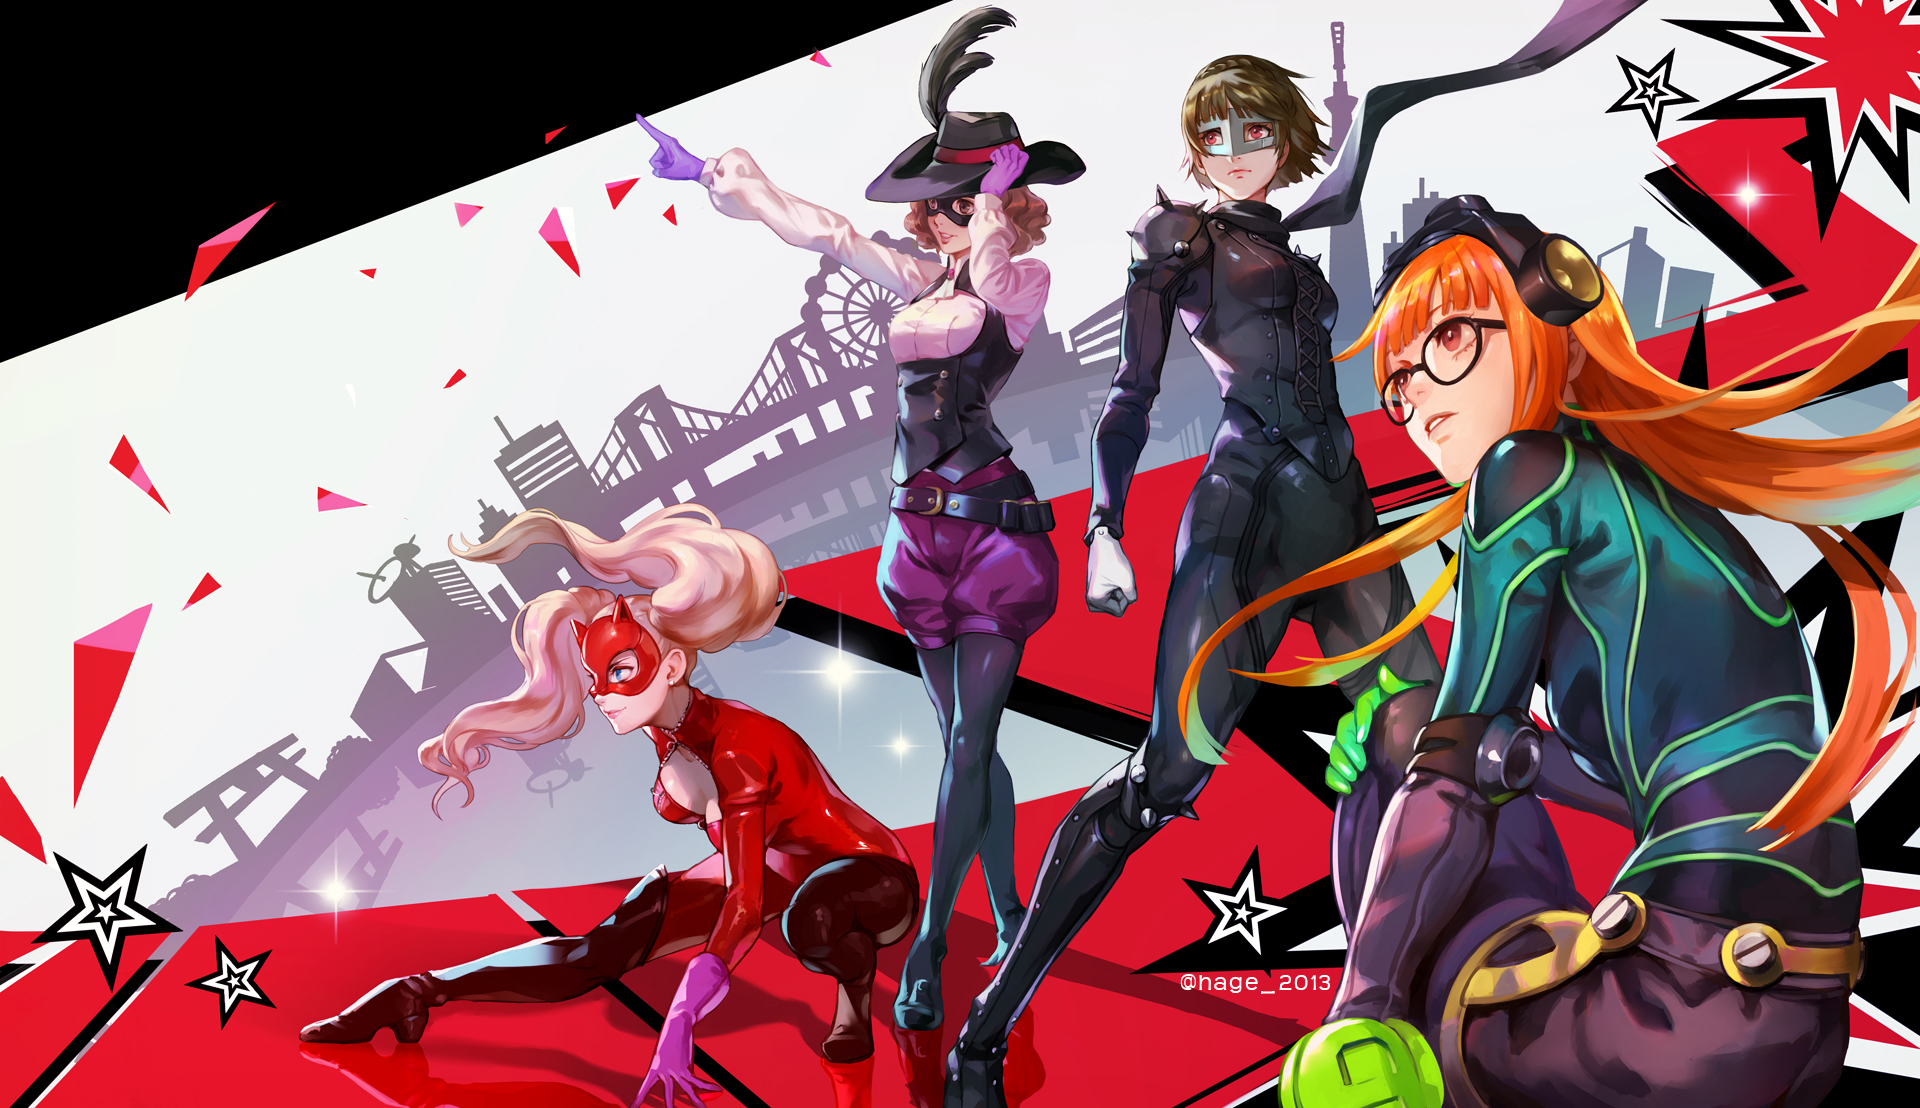 Persona 5 HD Wallpaper | Background Image | 1920x1108 | ID ...